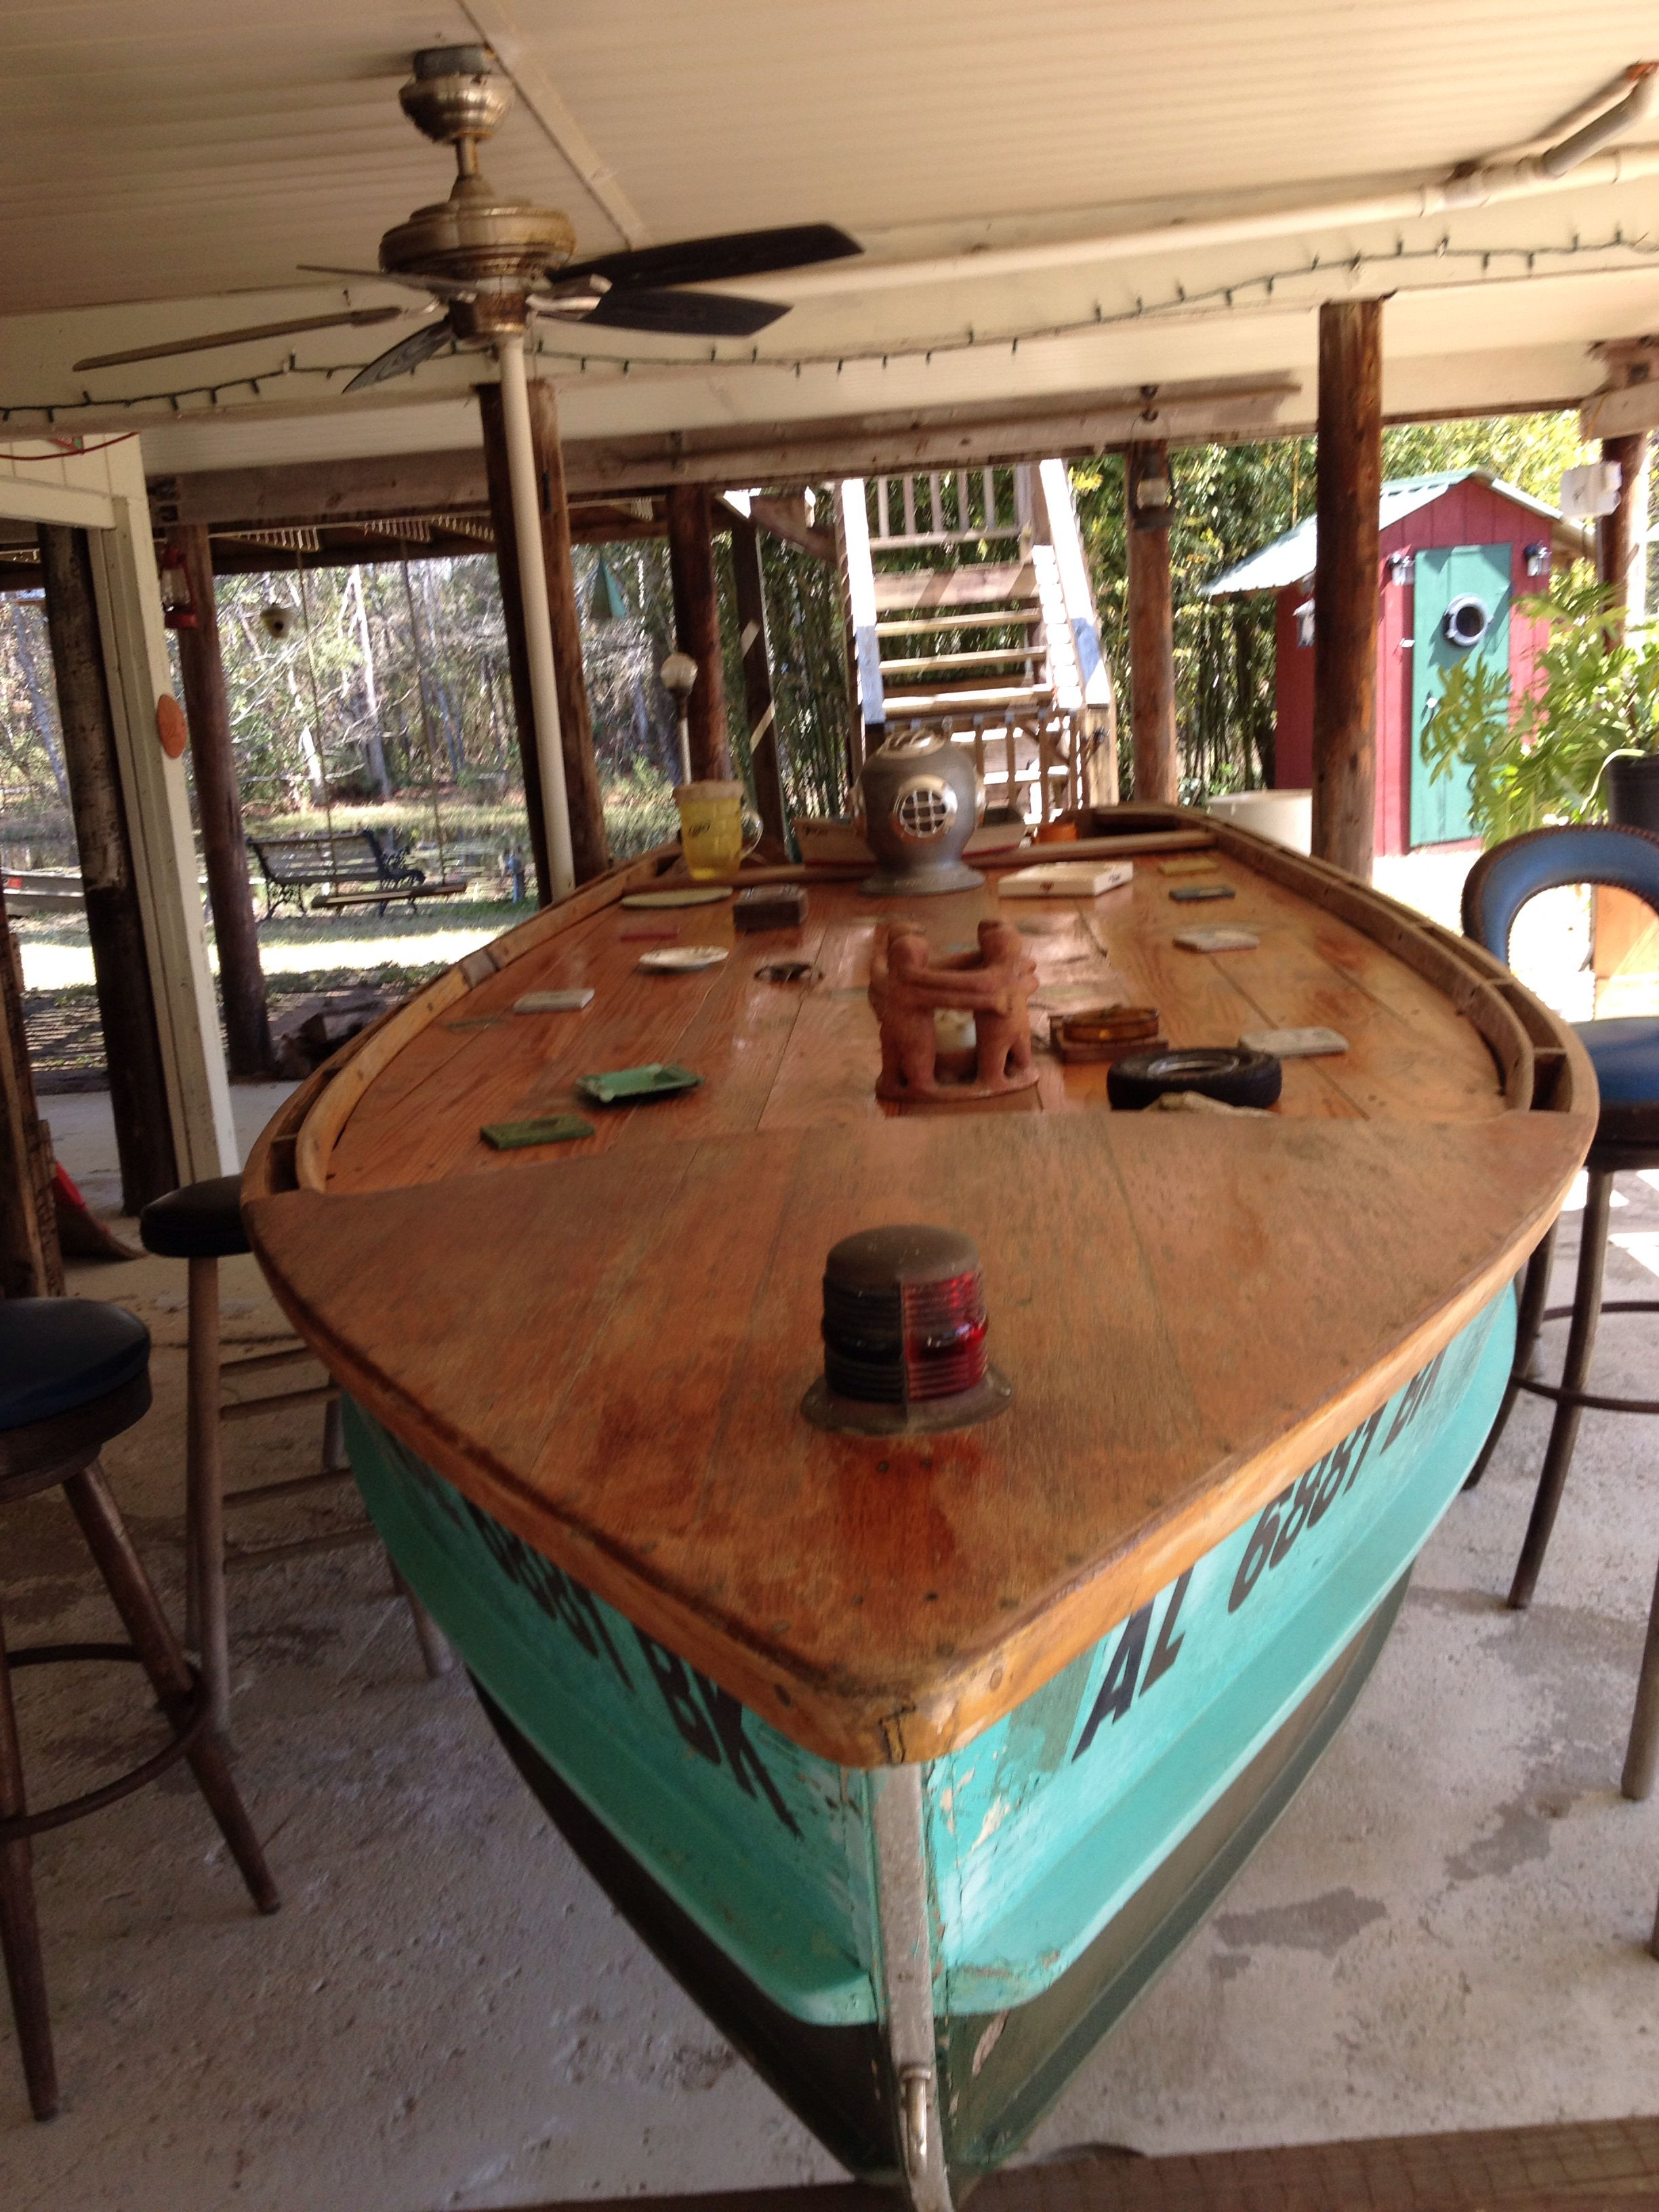 Boat Bar From Old Wooden Boat Boat Bar House Boat Boat Furniture